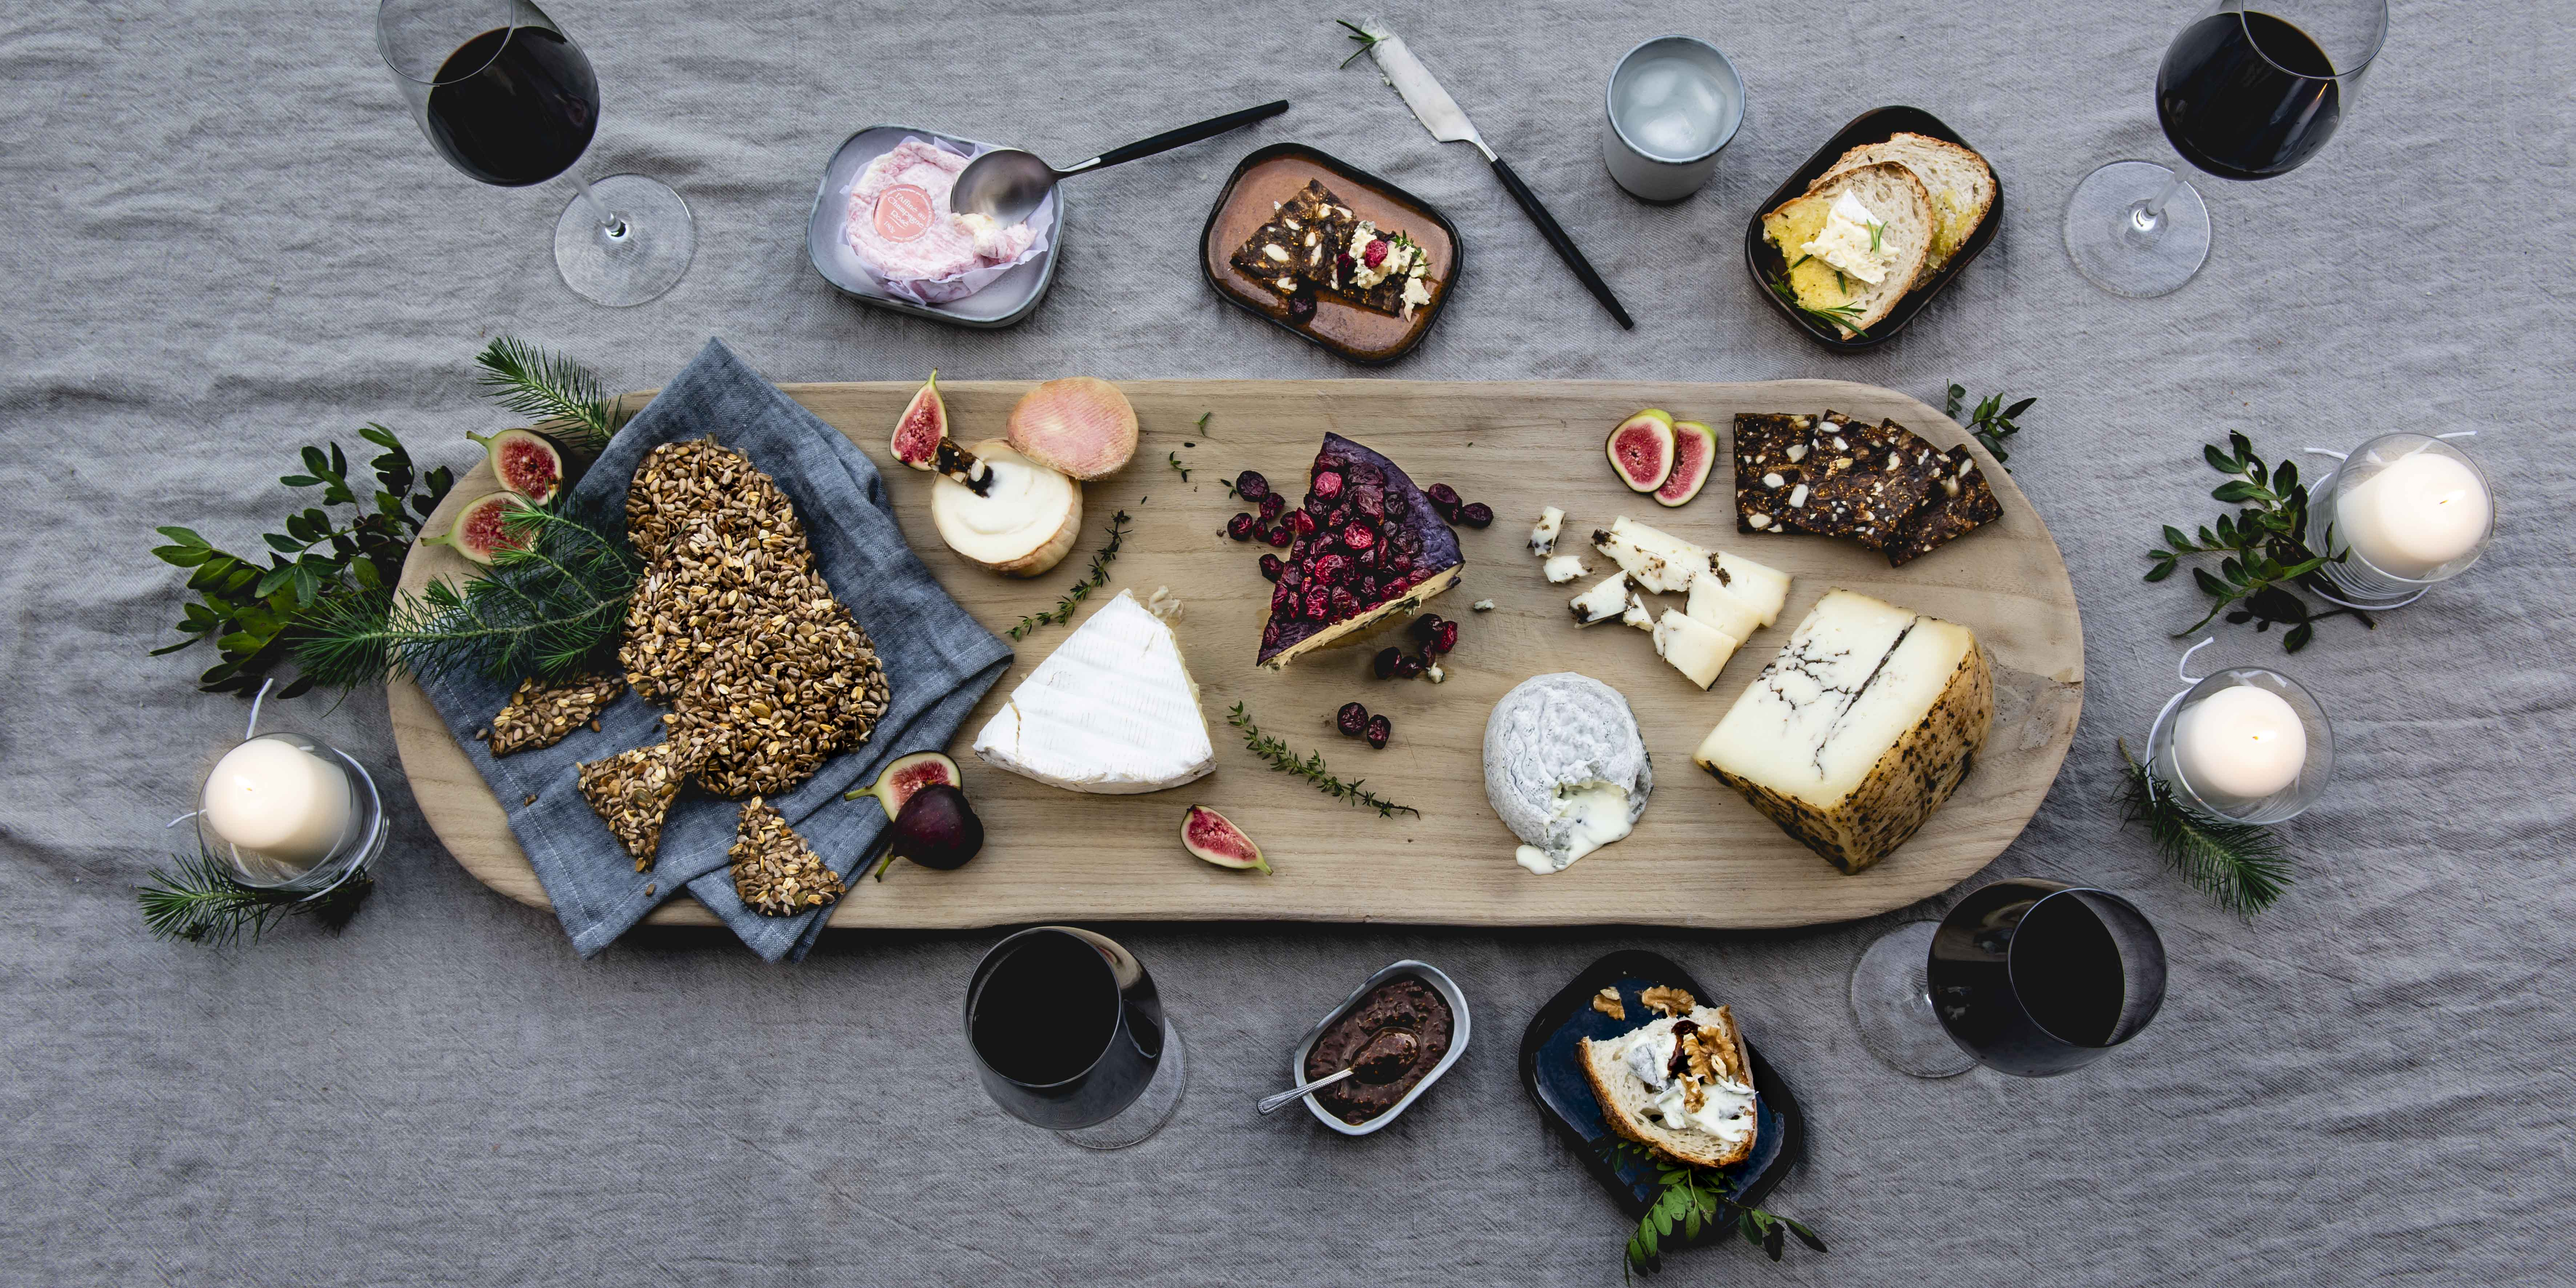 Zuivelhoeve Stefanie Spoelder Food Photography Delden